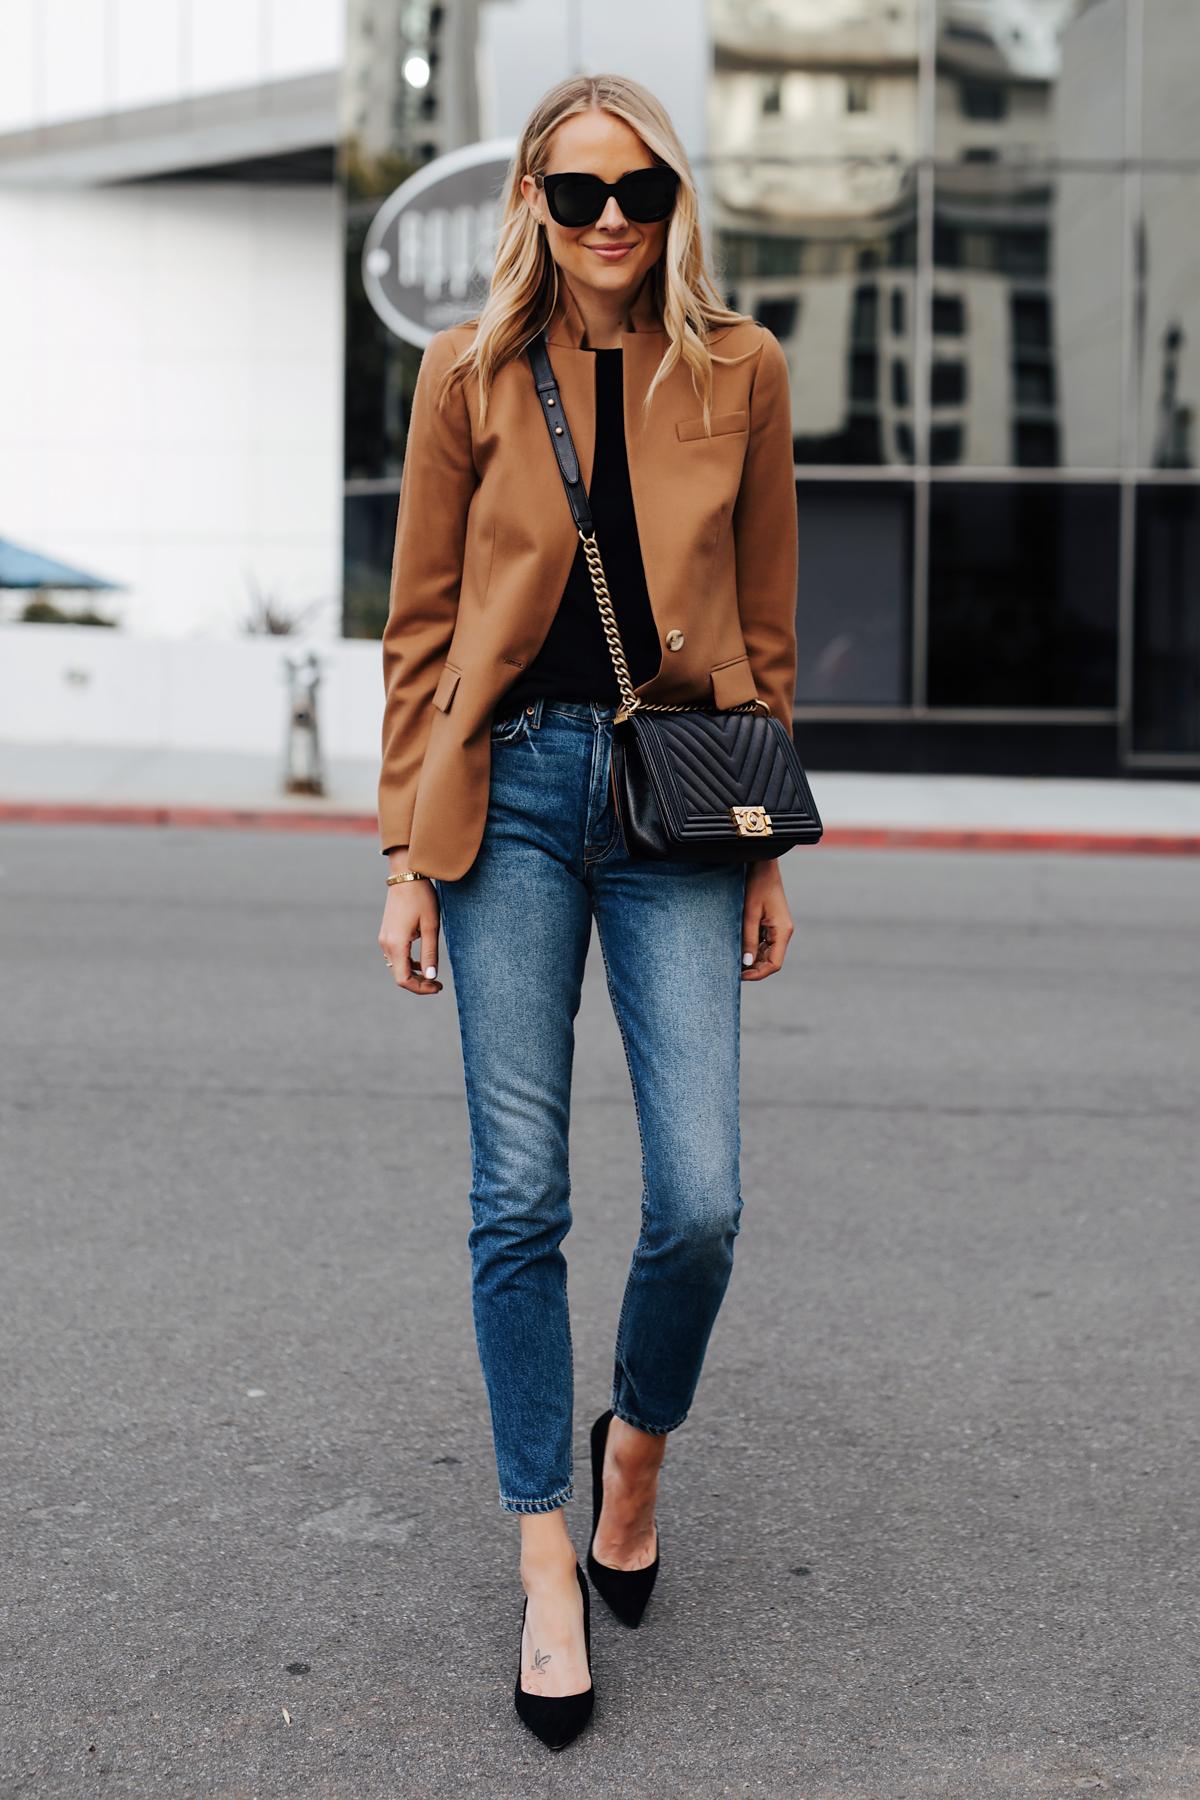 Blonde Woman Wearing Camel Blazer Denim Skinny Jeans Black Pumps eBay Authenticate Chanel Black Boy Bag Fashion Jackson San Diego Fashion Blogger Street Style